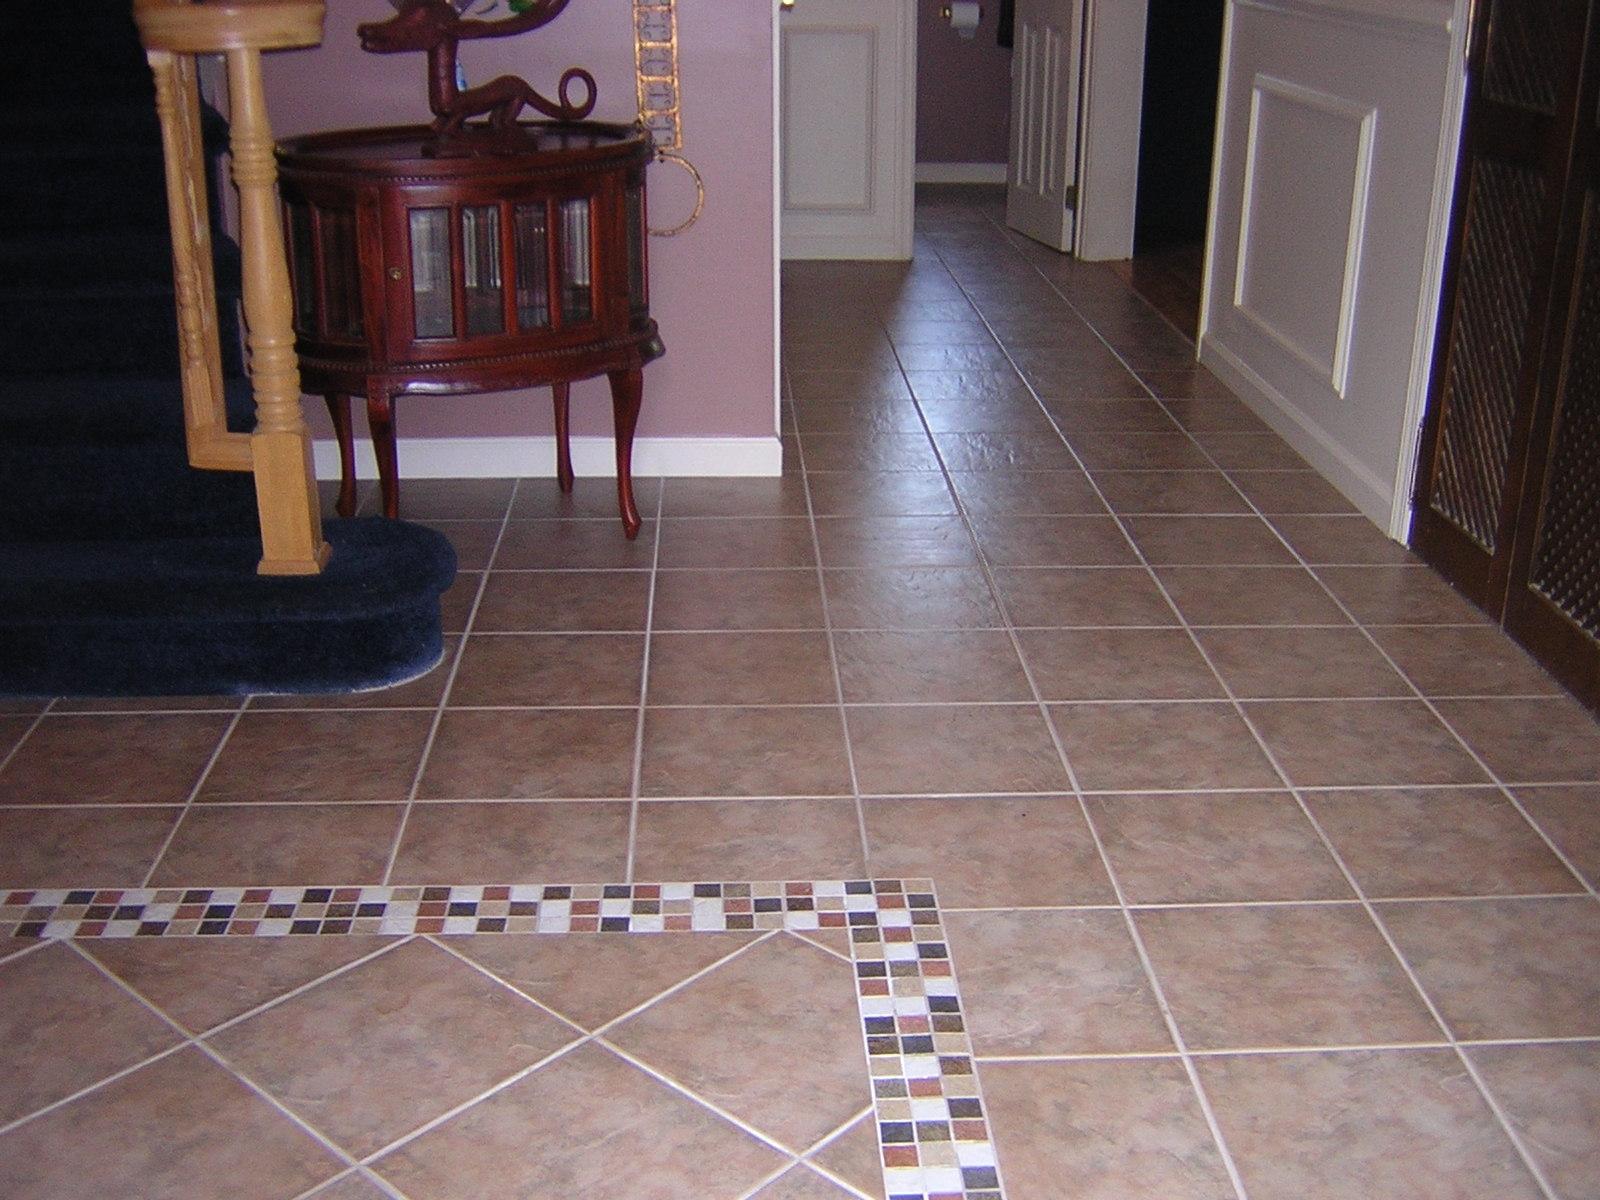 Stylish Floors N' More Inc image 3